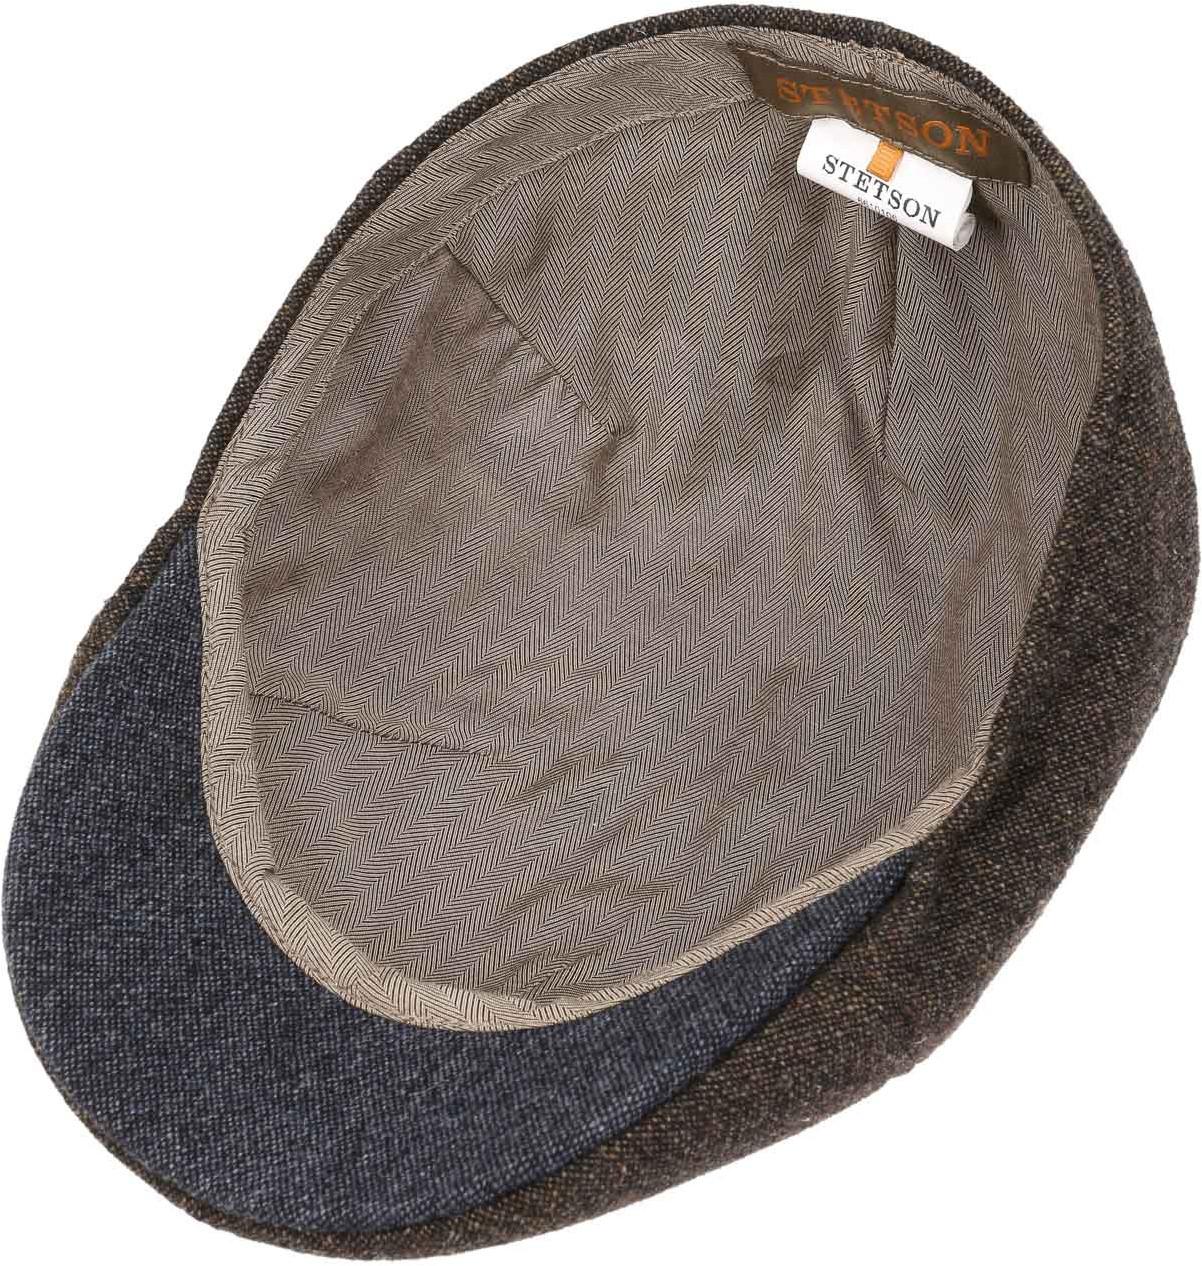 cf9fac06096 ... 479c3b54337b2 Stetson Texas Wool Sportcap - Sixpence - fluer.dk ...